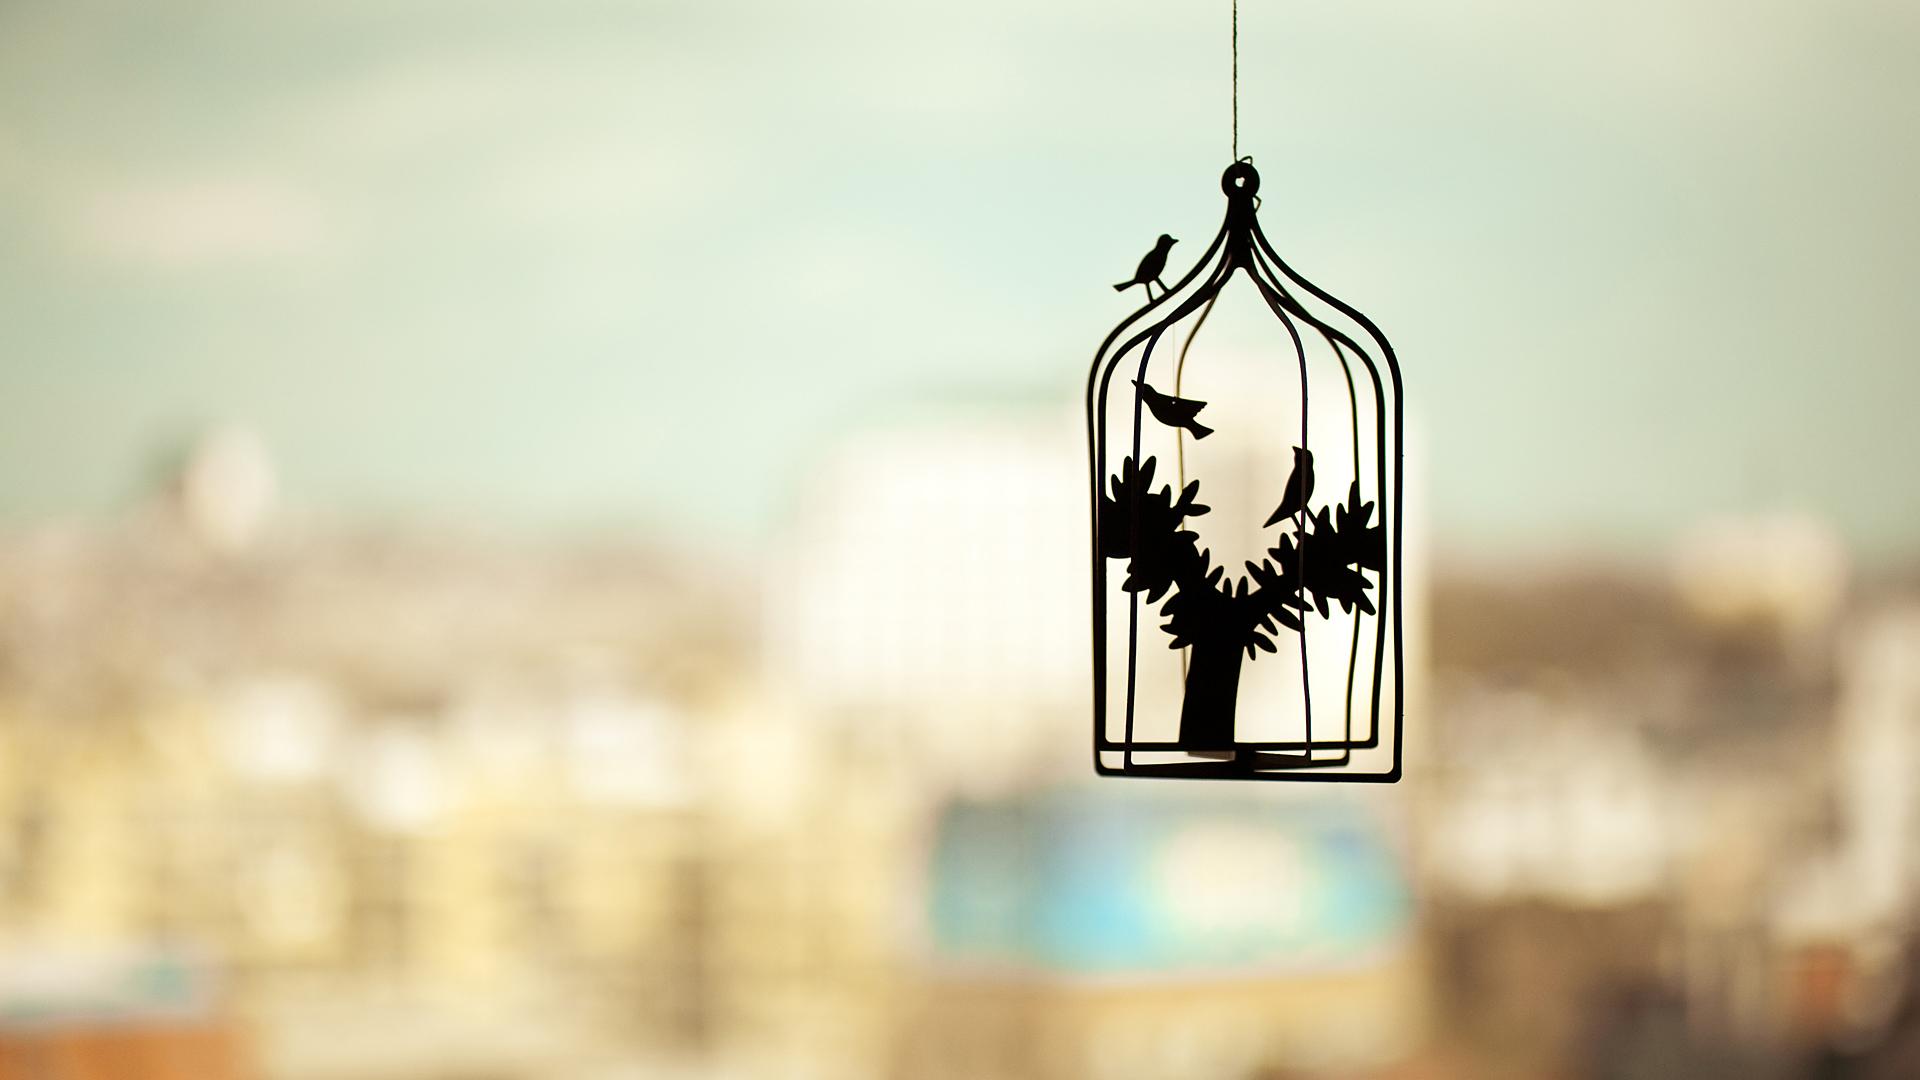 Bird Cage দেওয়ালপত্র